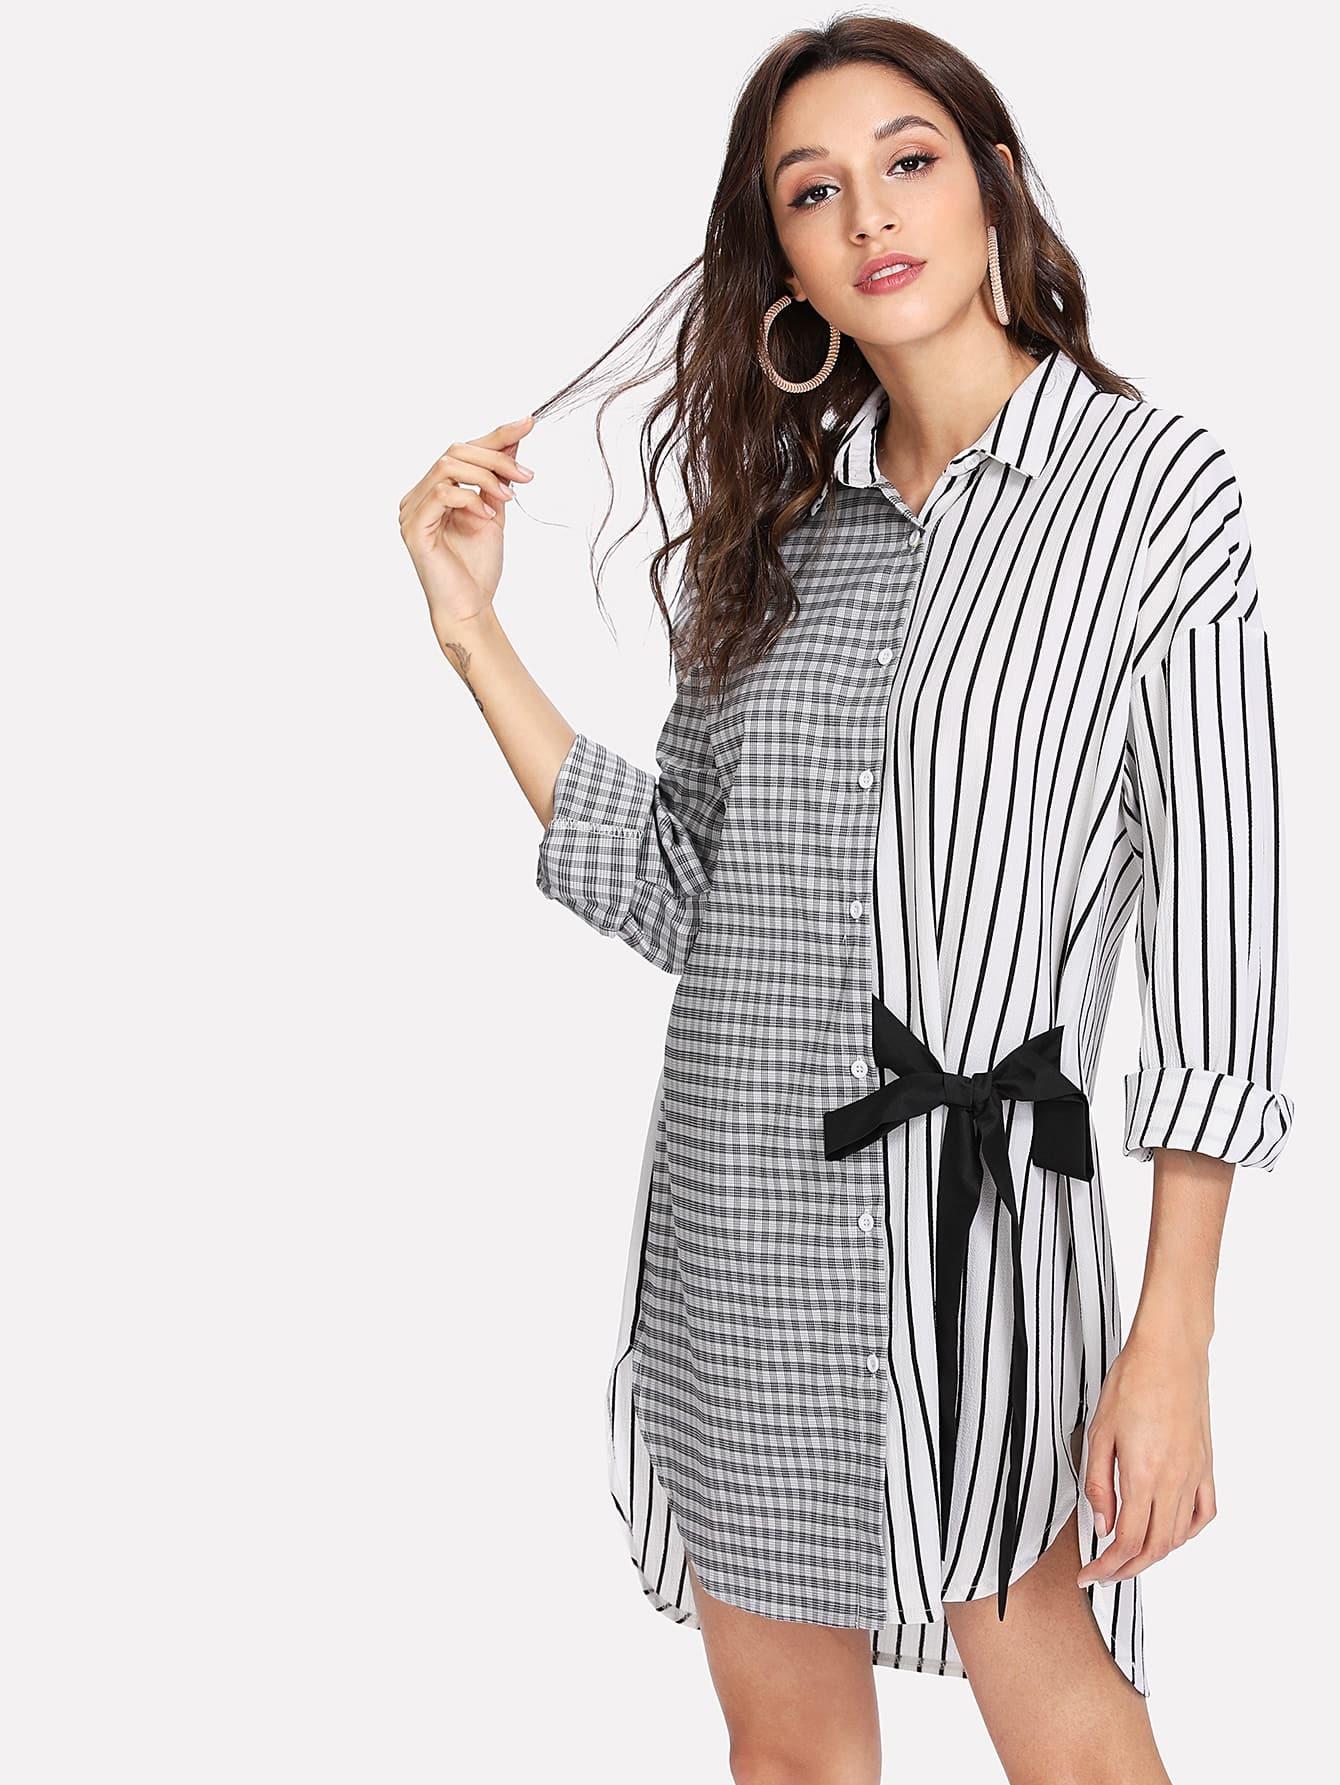 Tie Detail High Low Curved Hem Shirt Dress apricot v neck lace detail curved hem flared sleeve dress